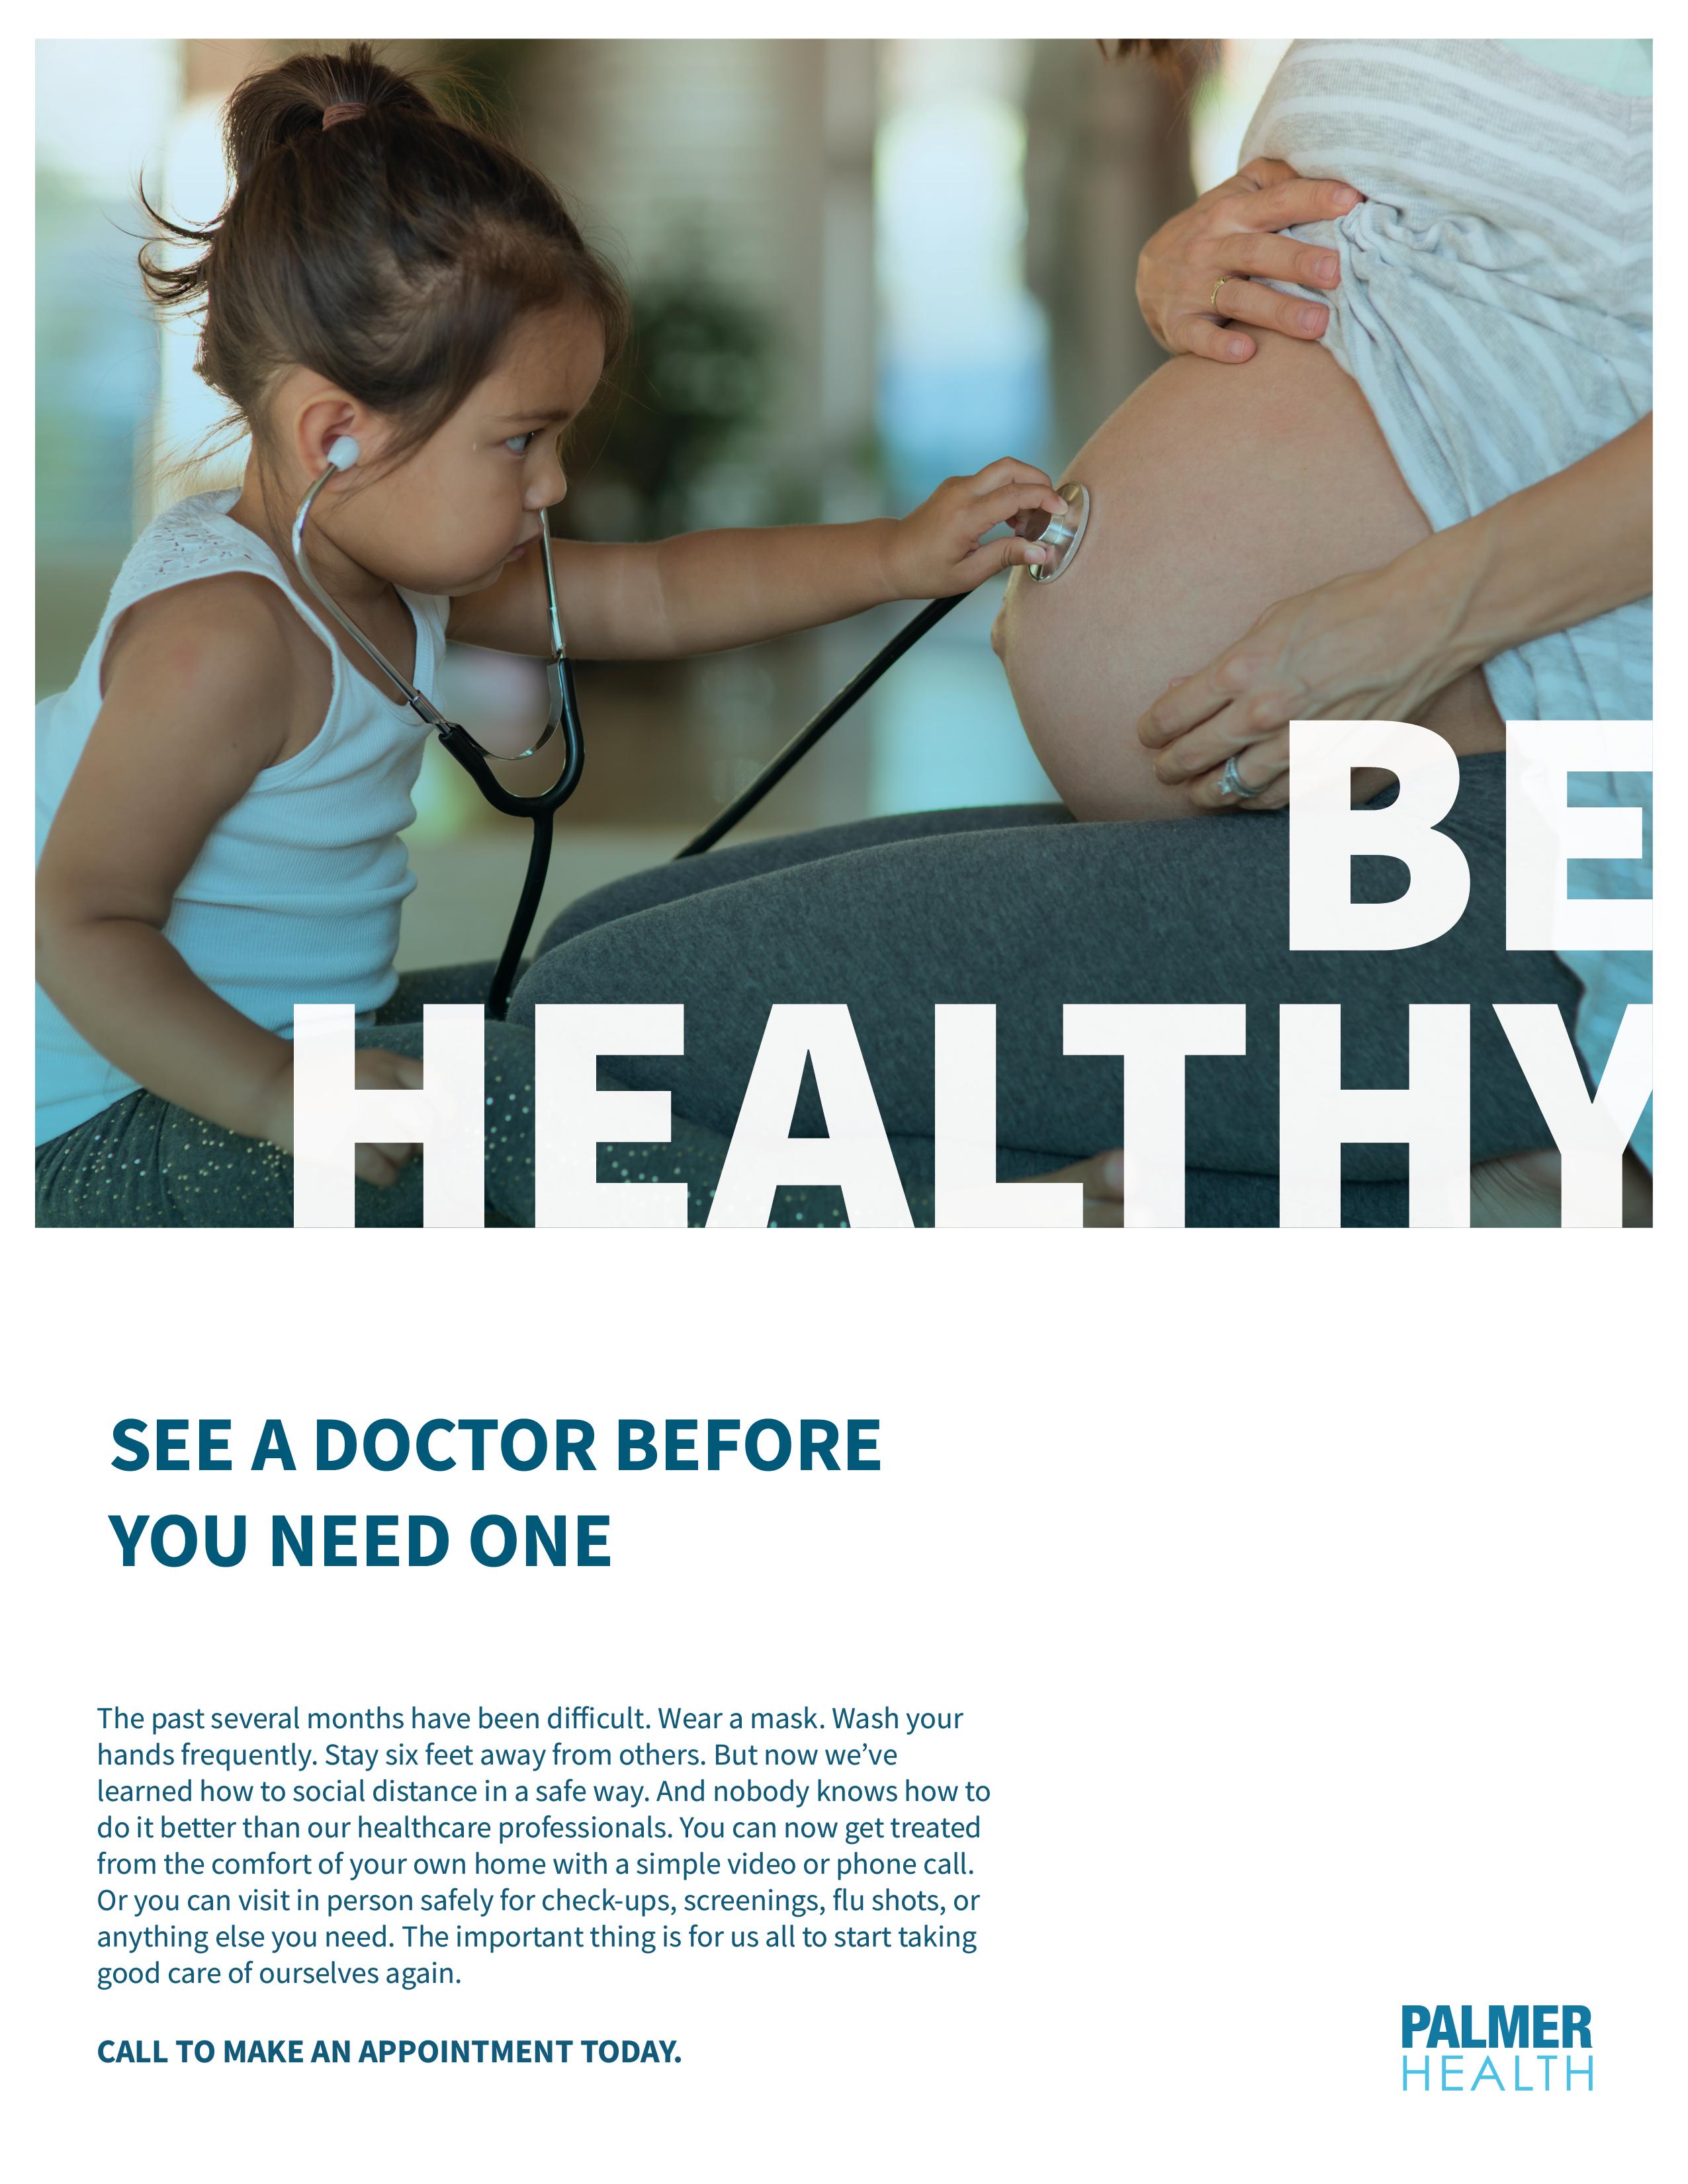 36152 Palmer health as dev for website-be  healthy-v5-aug 21-03